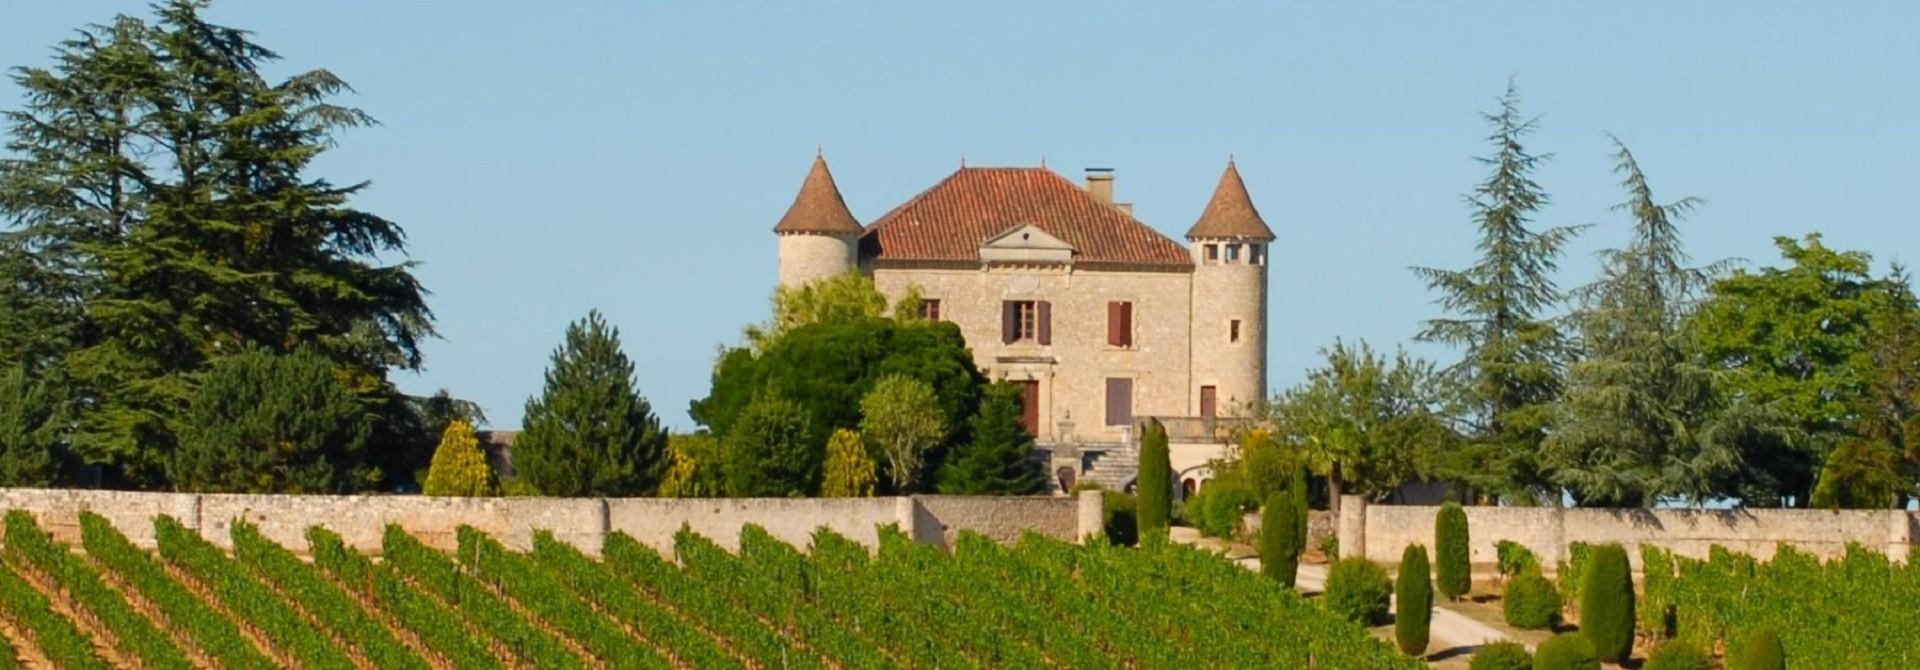 vineyard-640953